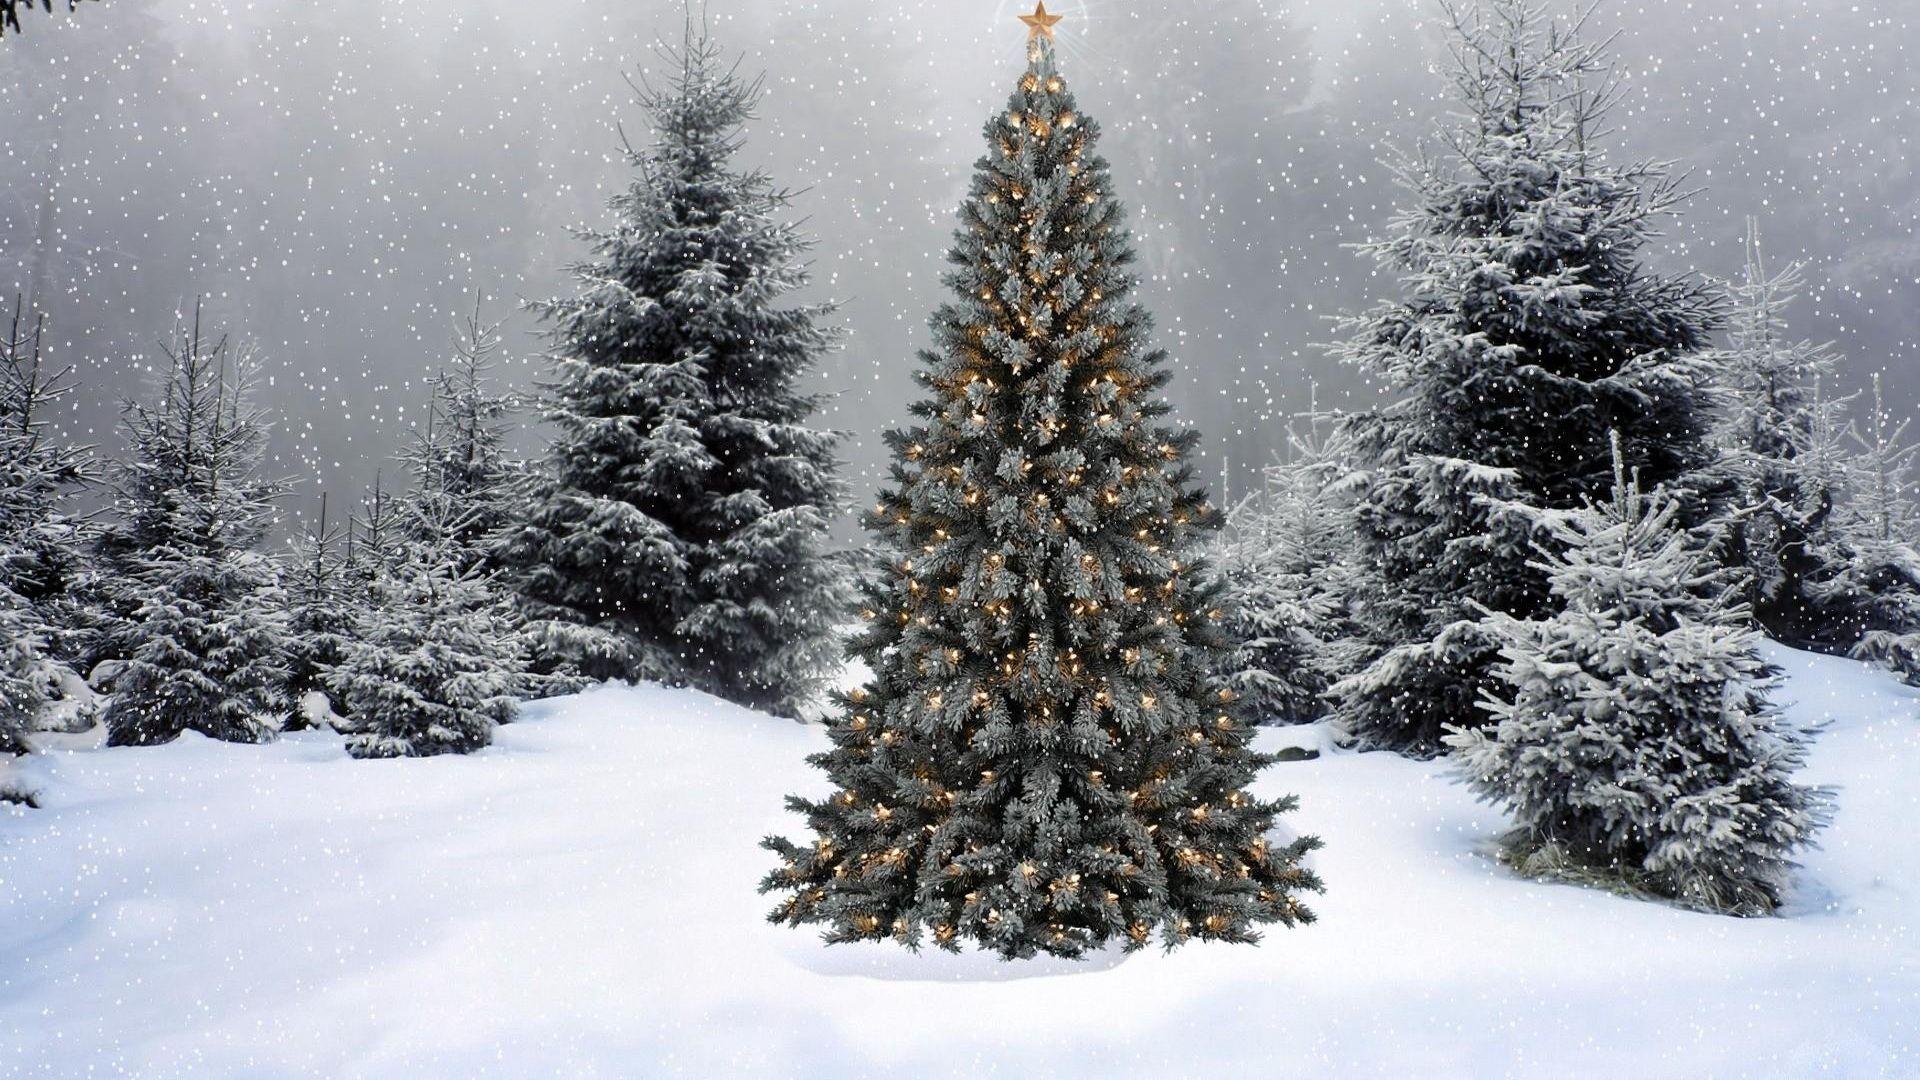 Christmas Tree download wallpaper image